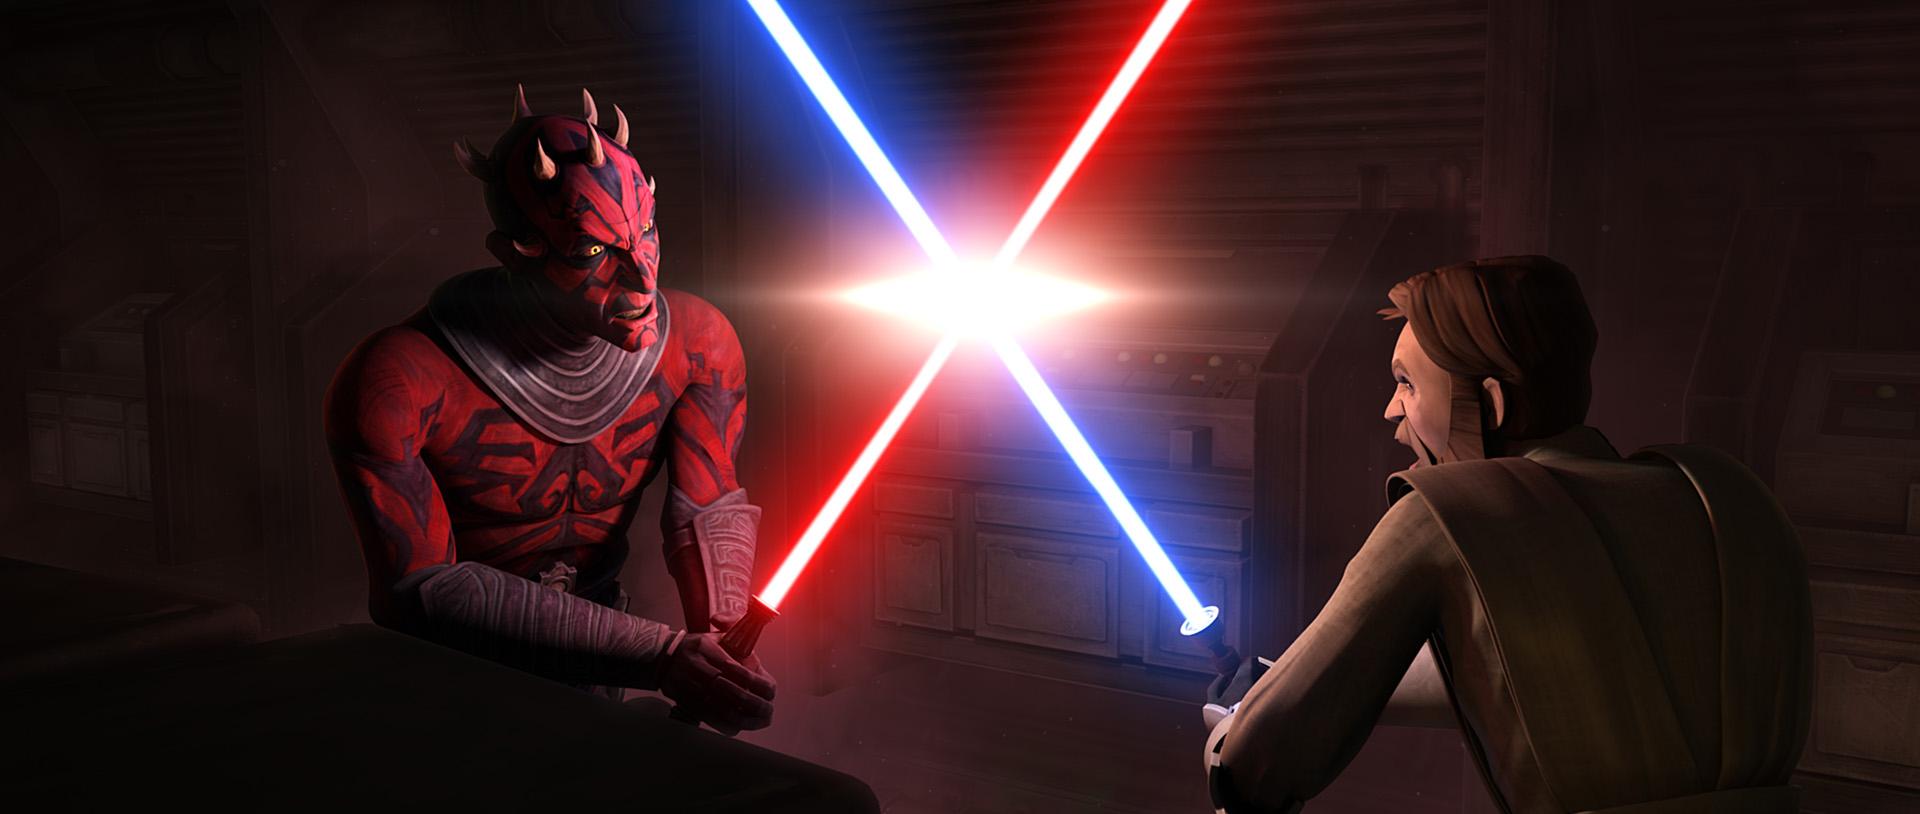 Star Wars Obi Wan vs Darth Maul Darth Maul Duels Obi-wan